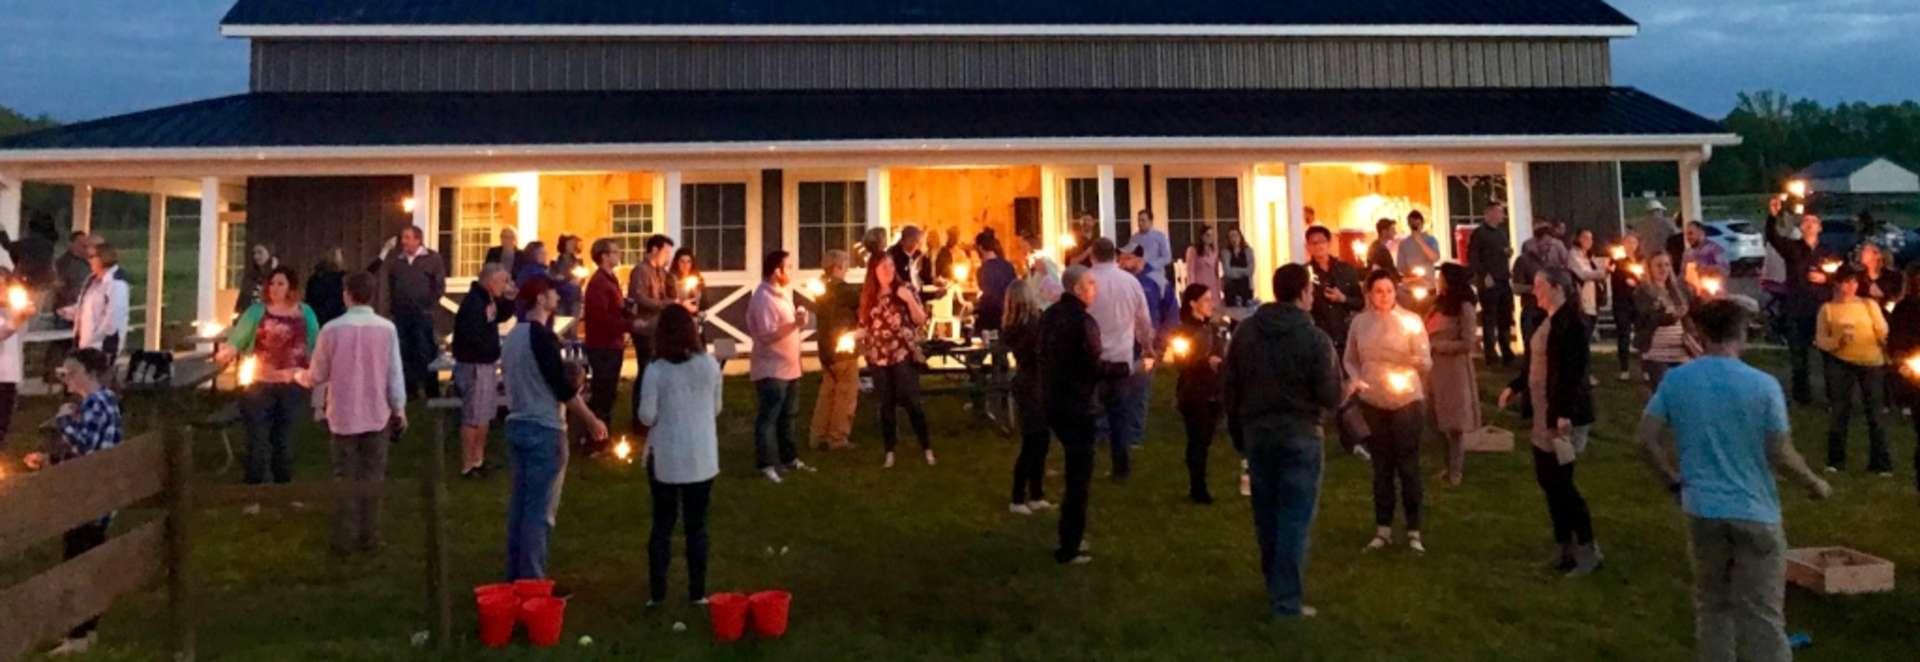 wickhams-pickn-patch-stanley-event-barn